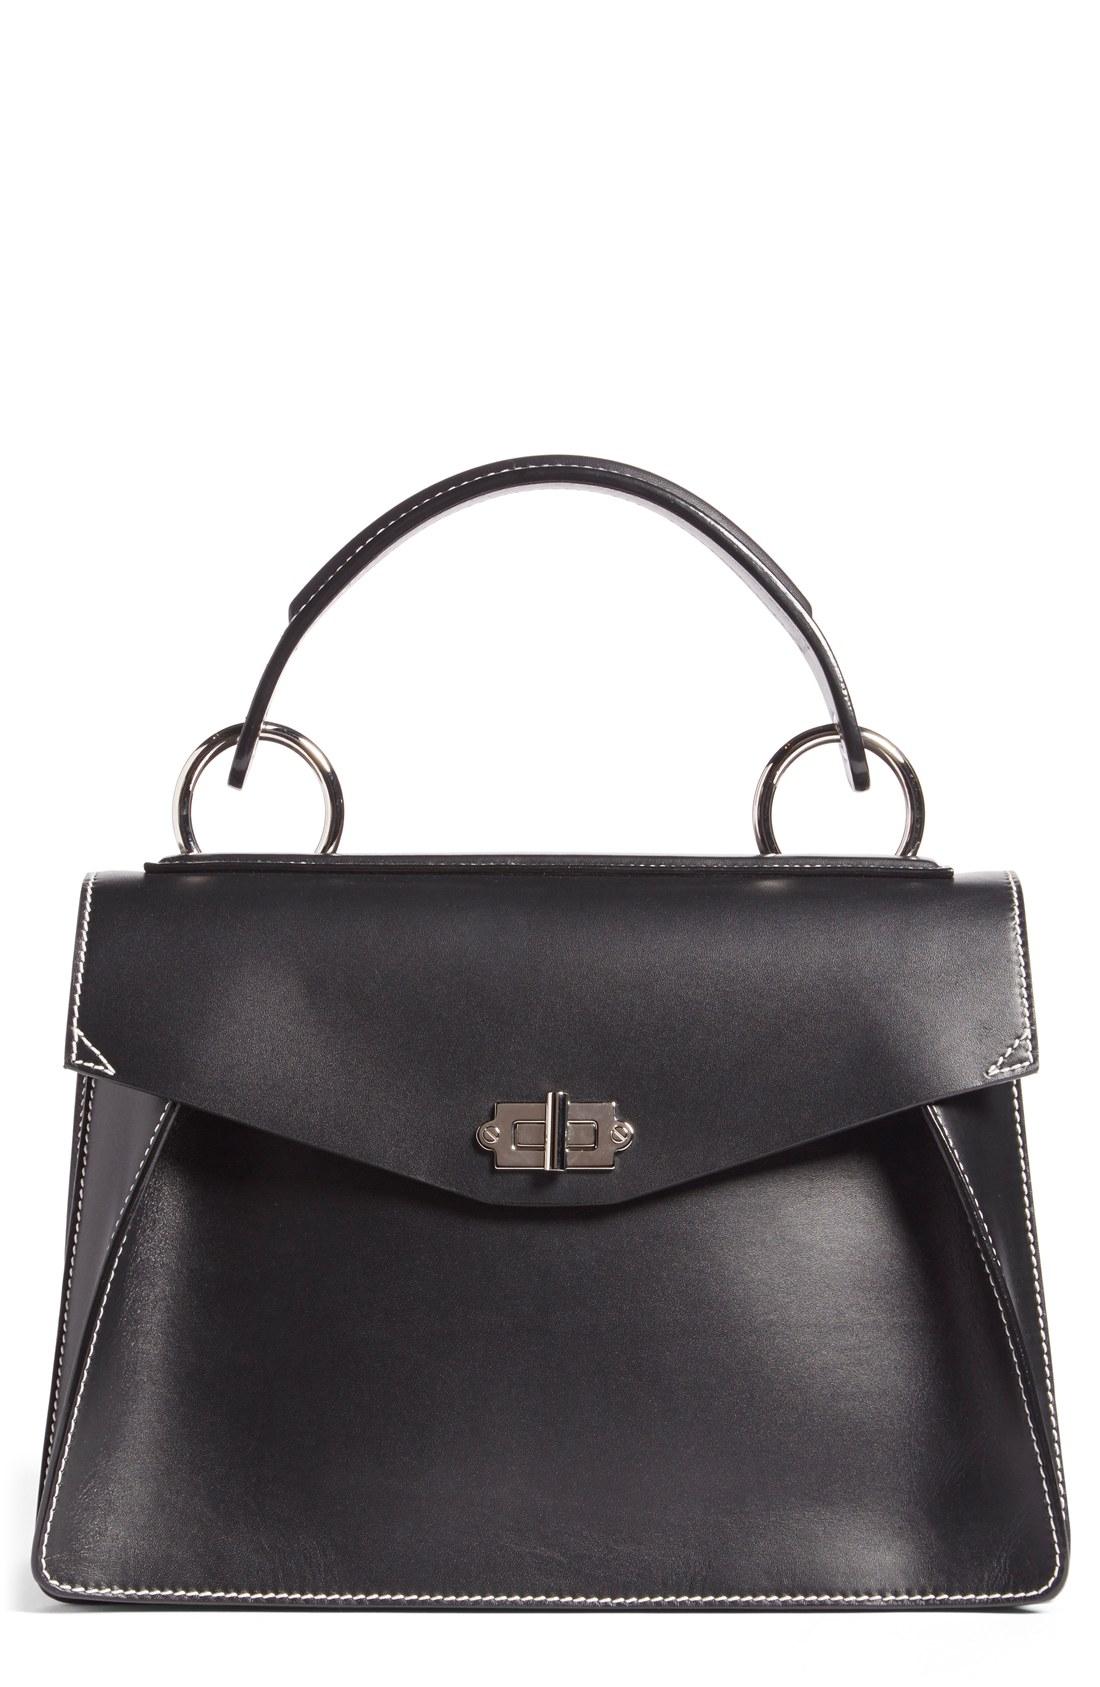 proenza schouler bag proenza schouler u0027medium havau0027 top handle calfskin leather satchel |  nordstrom EPFIAGY